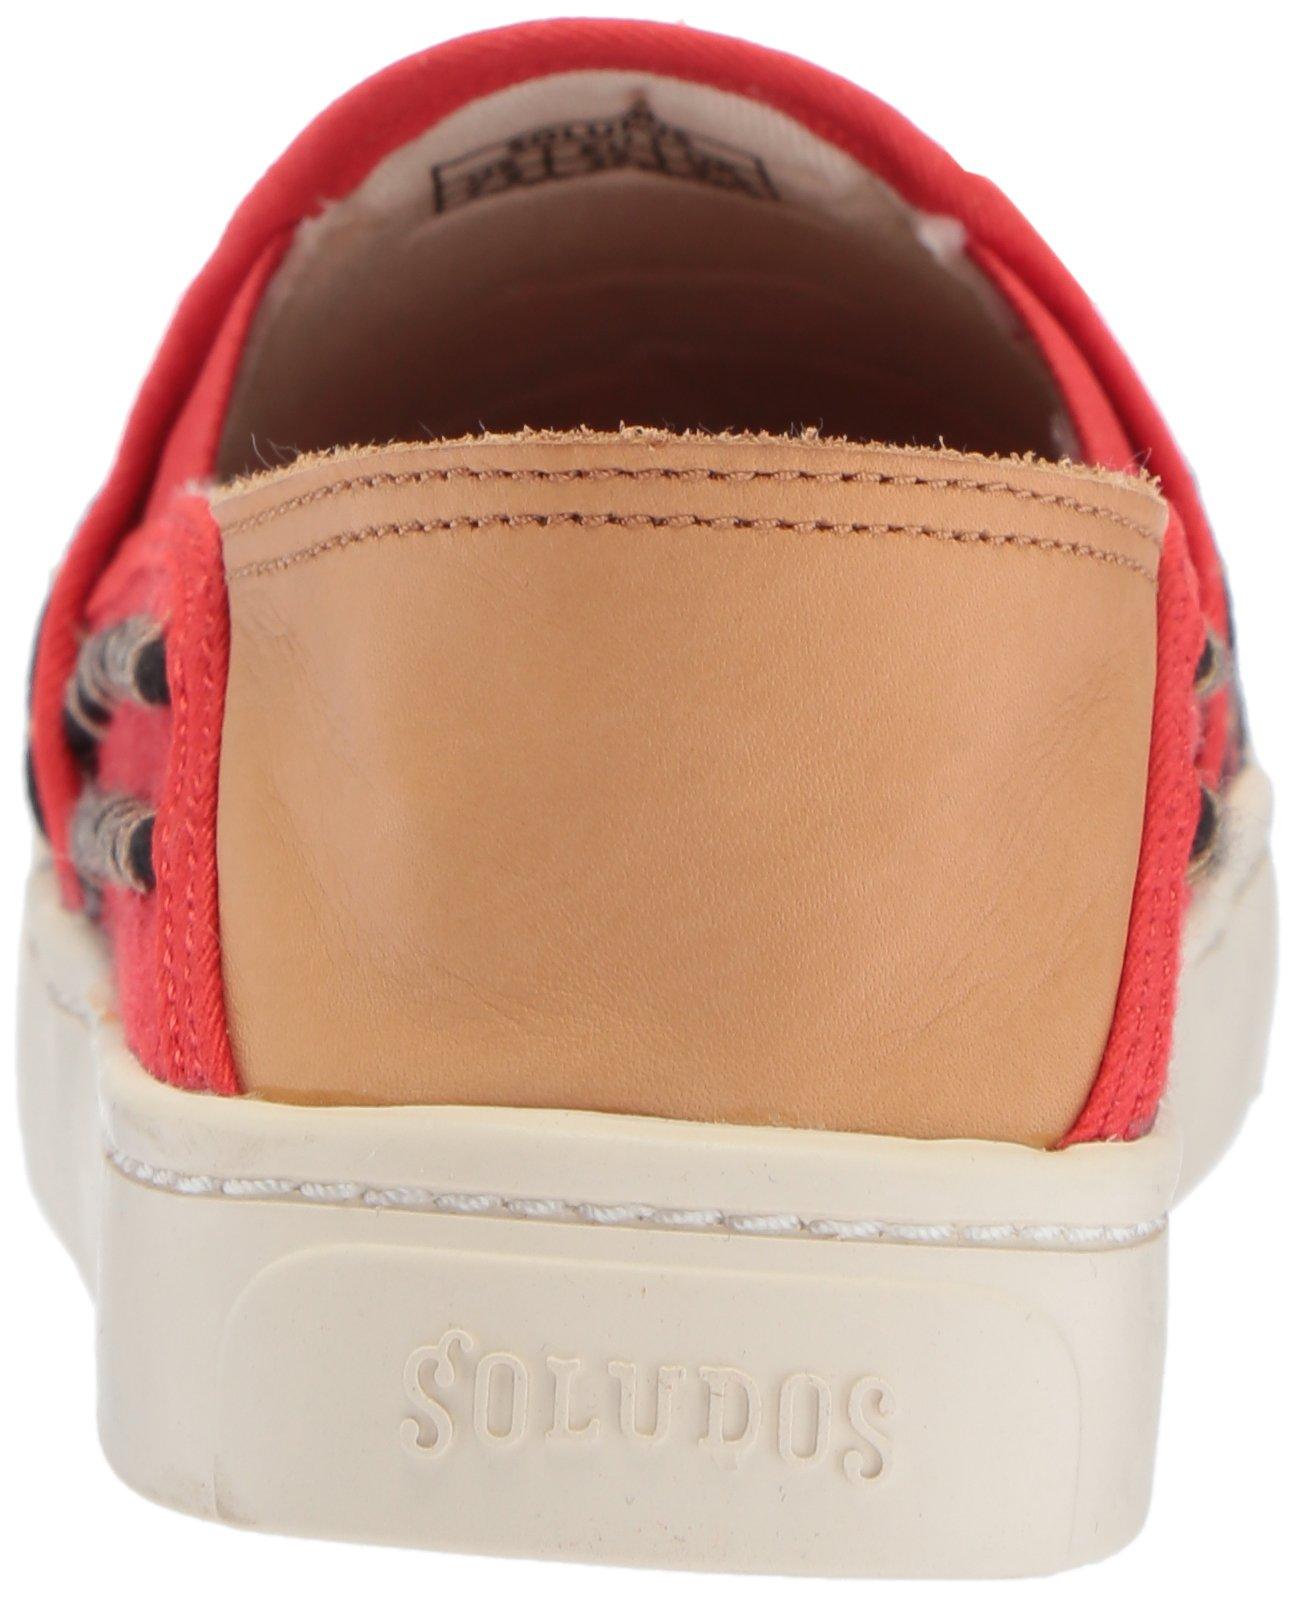 Soludos Women's Tassel Slip Sneaker, Red/Beige, 8 B US by Soludos (Image #2)